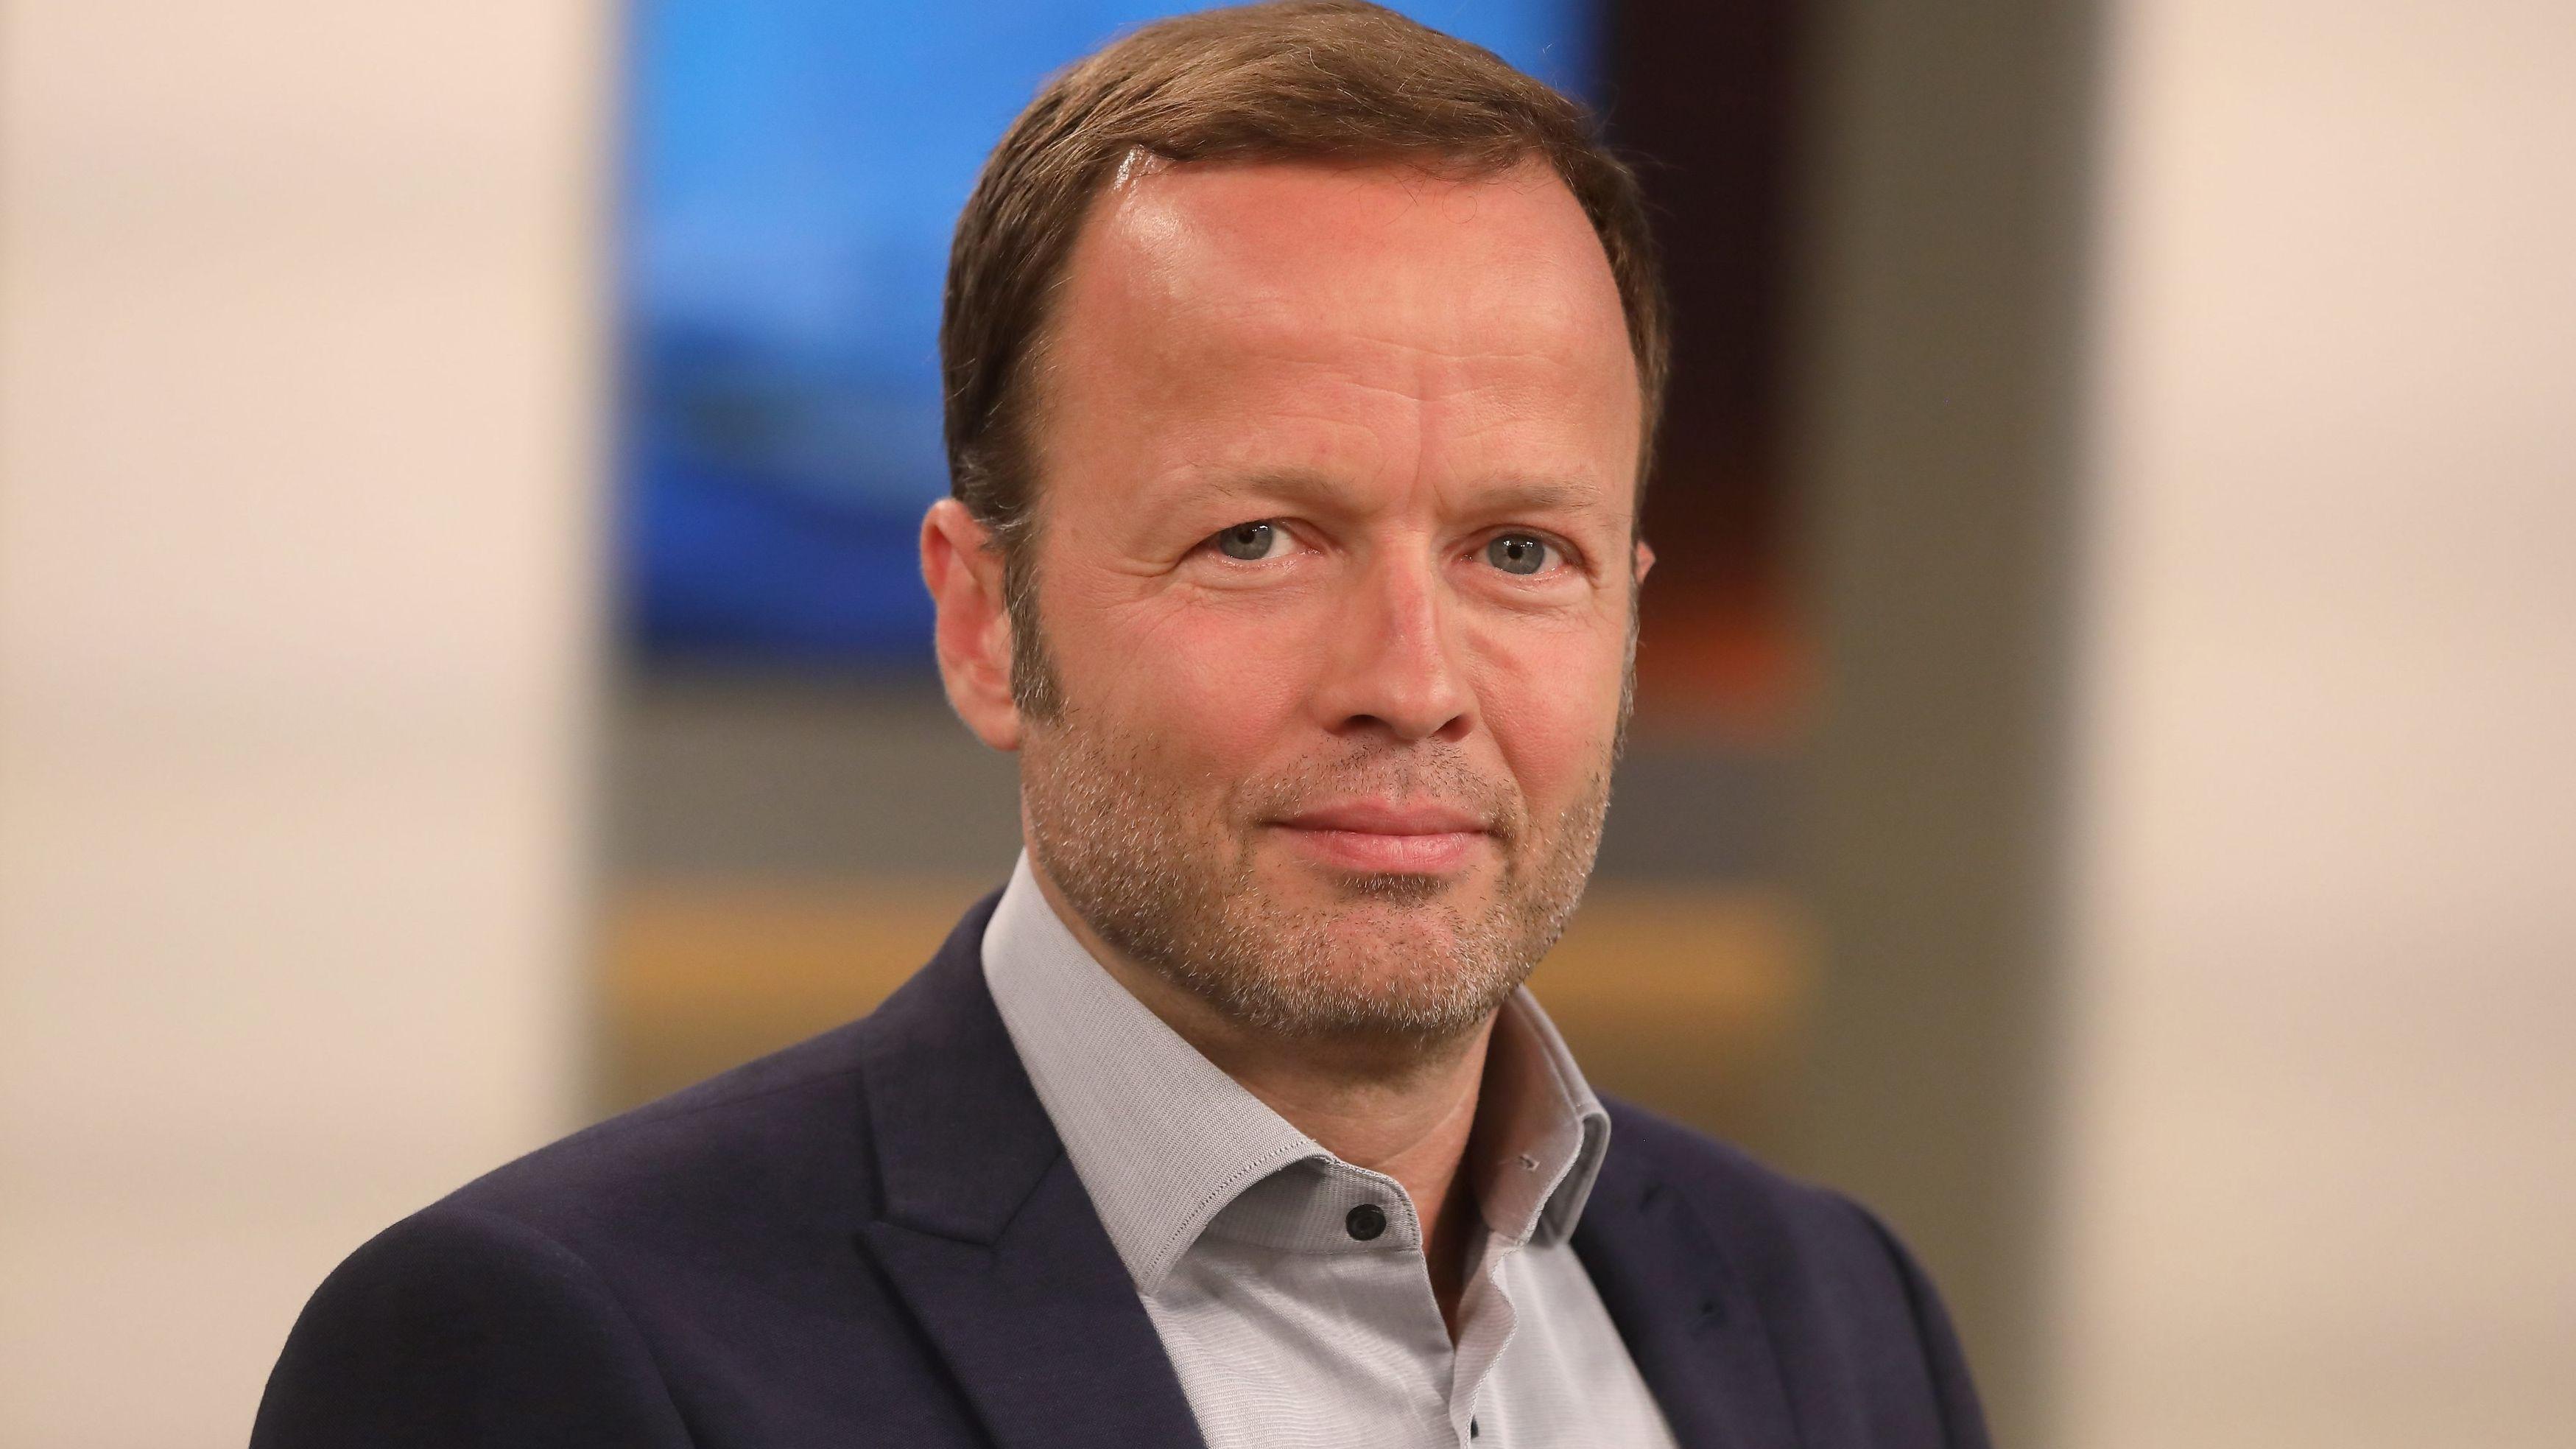 Georg Restle, Leiter der Redaktion Monitor, bekam eine Morddrohung